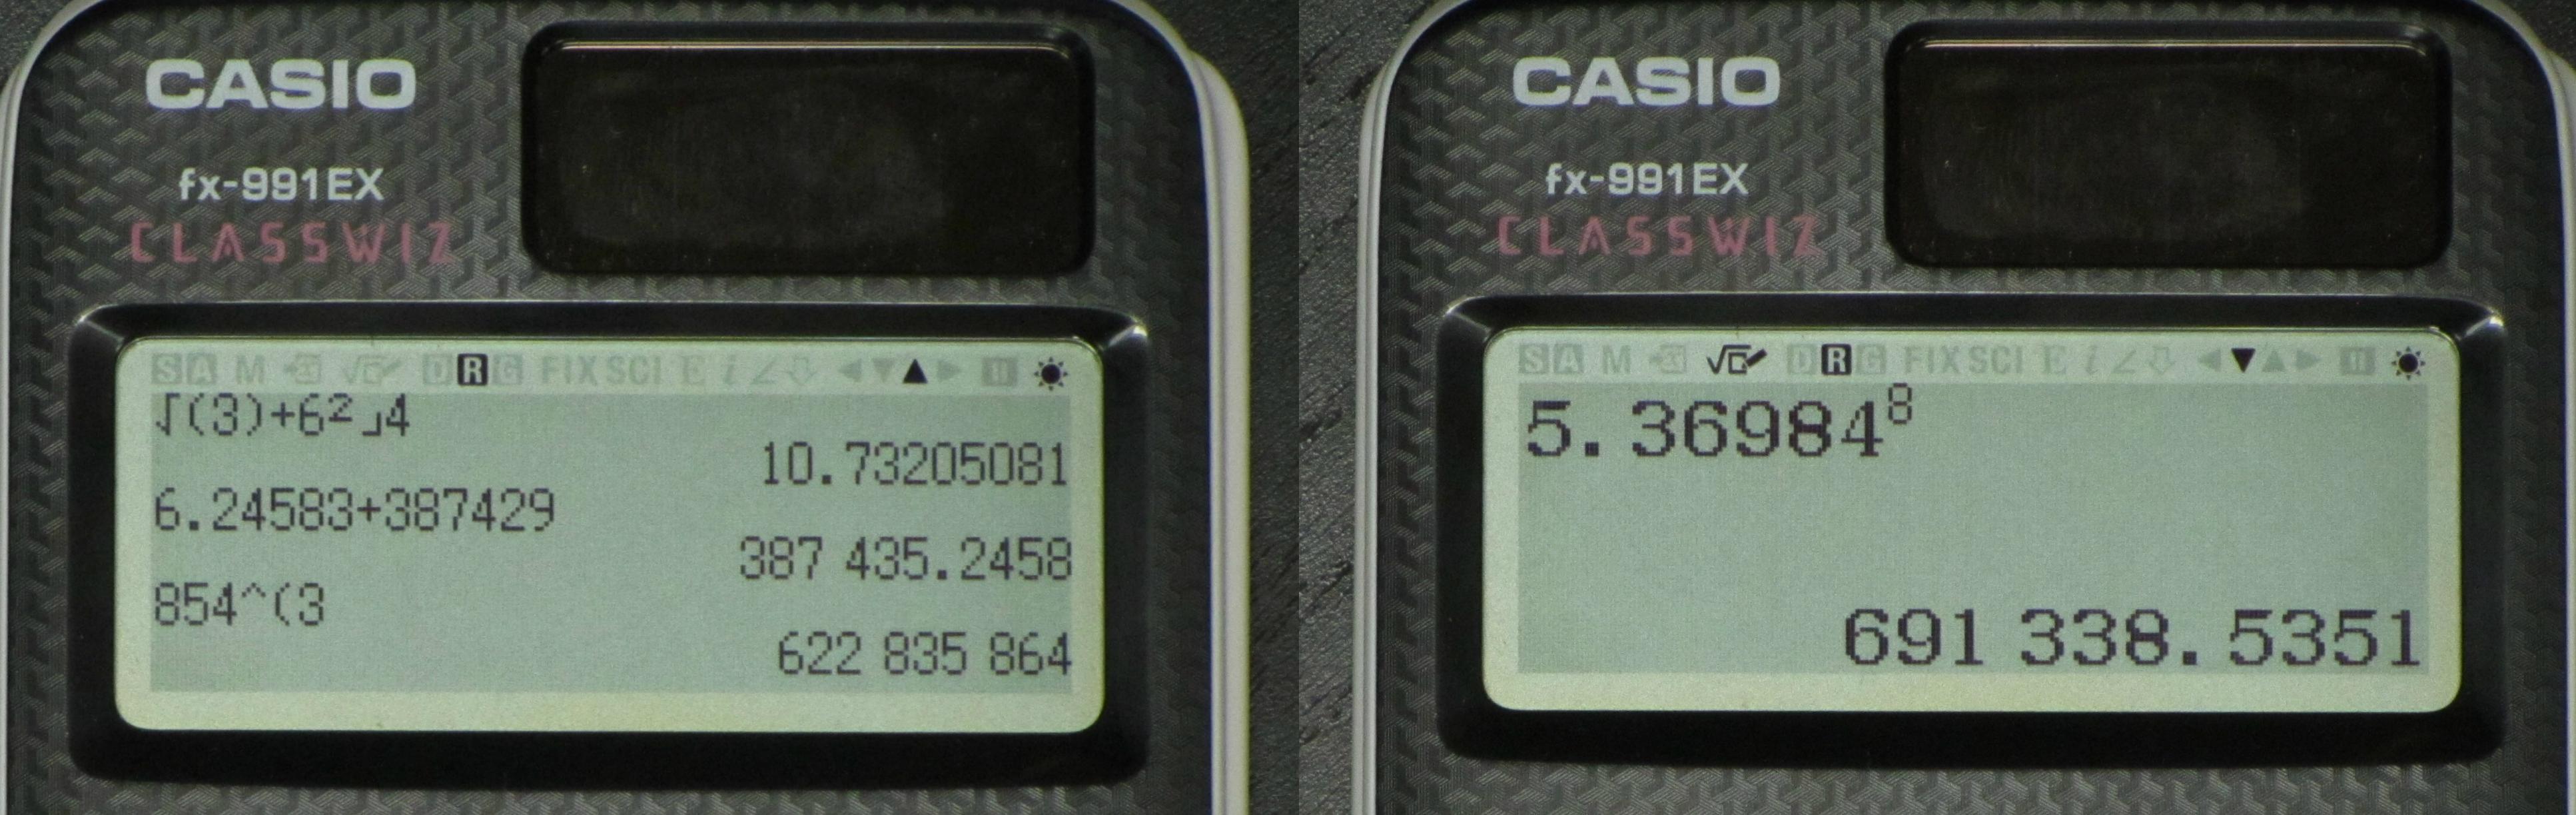 Casio ClassWiz fx-991EX Full Review - Math Class Calculator